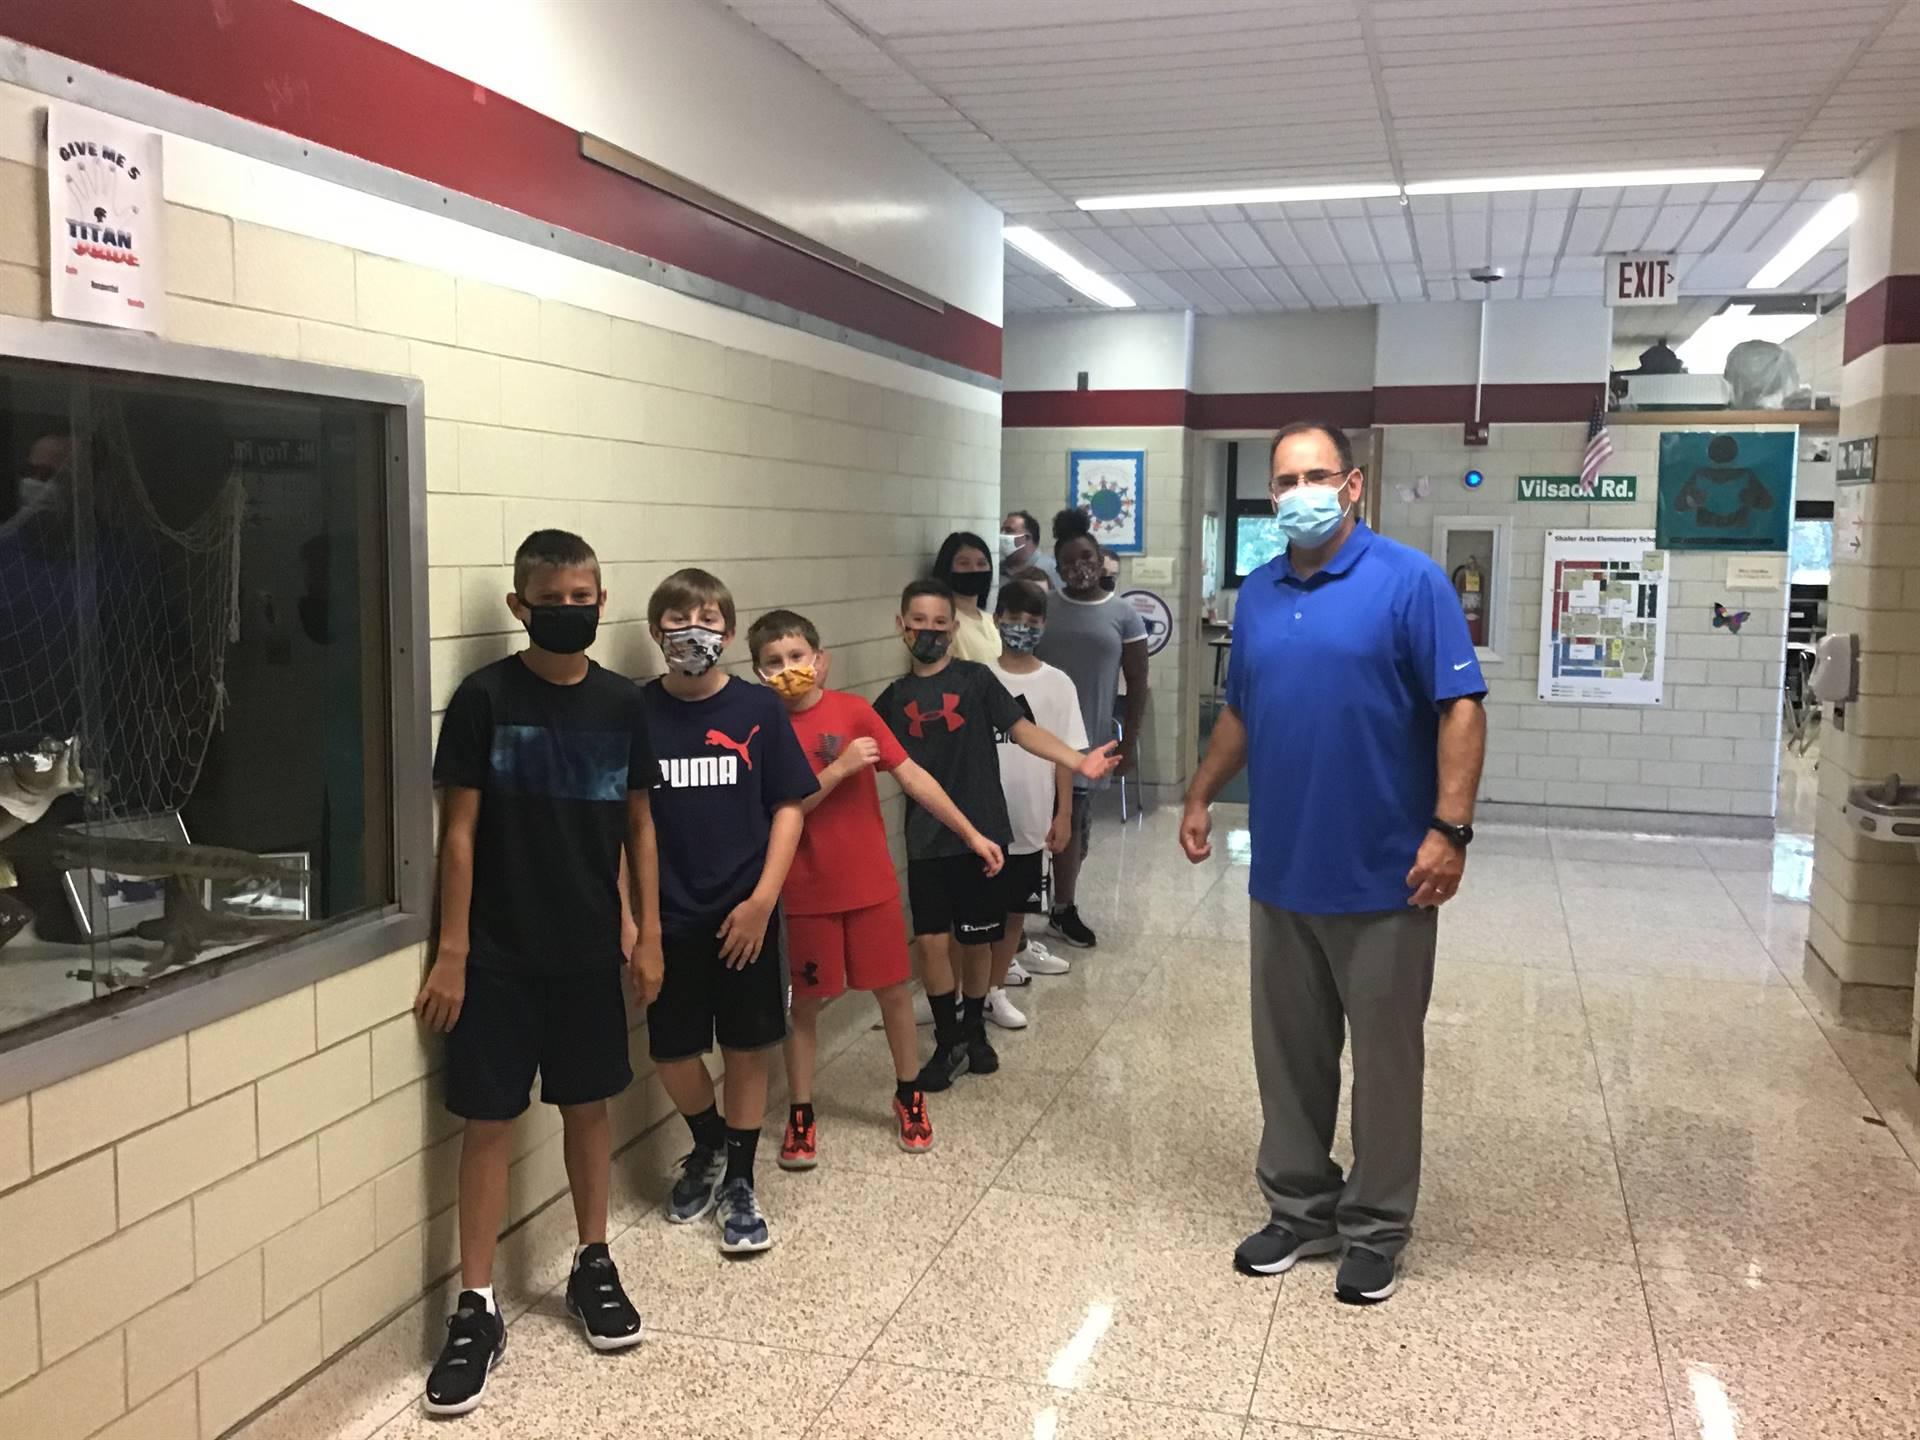 6th graders walking down the hallway